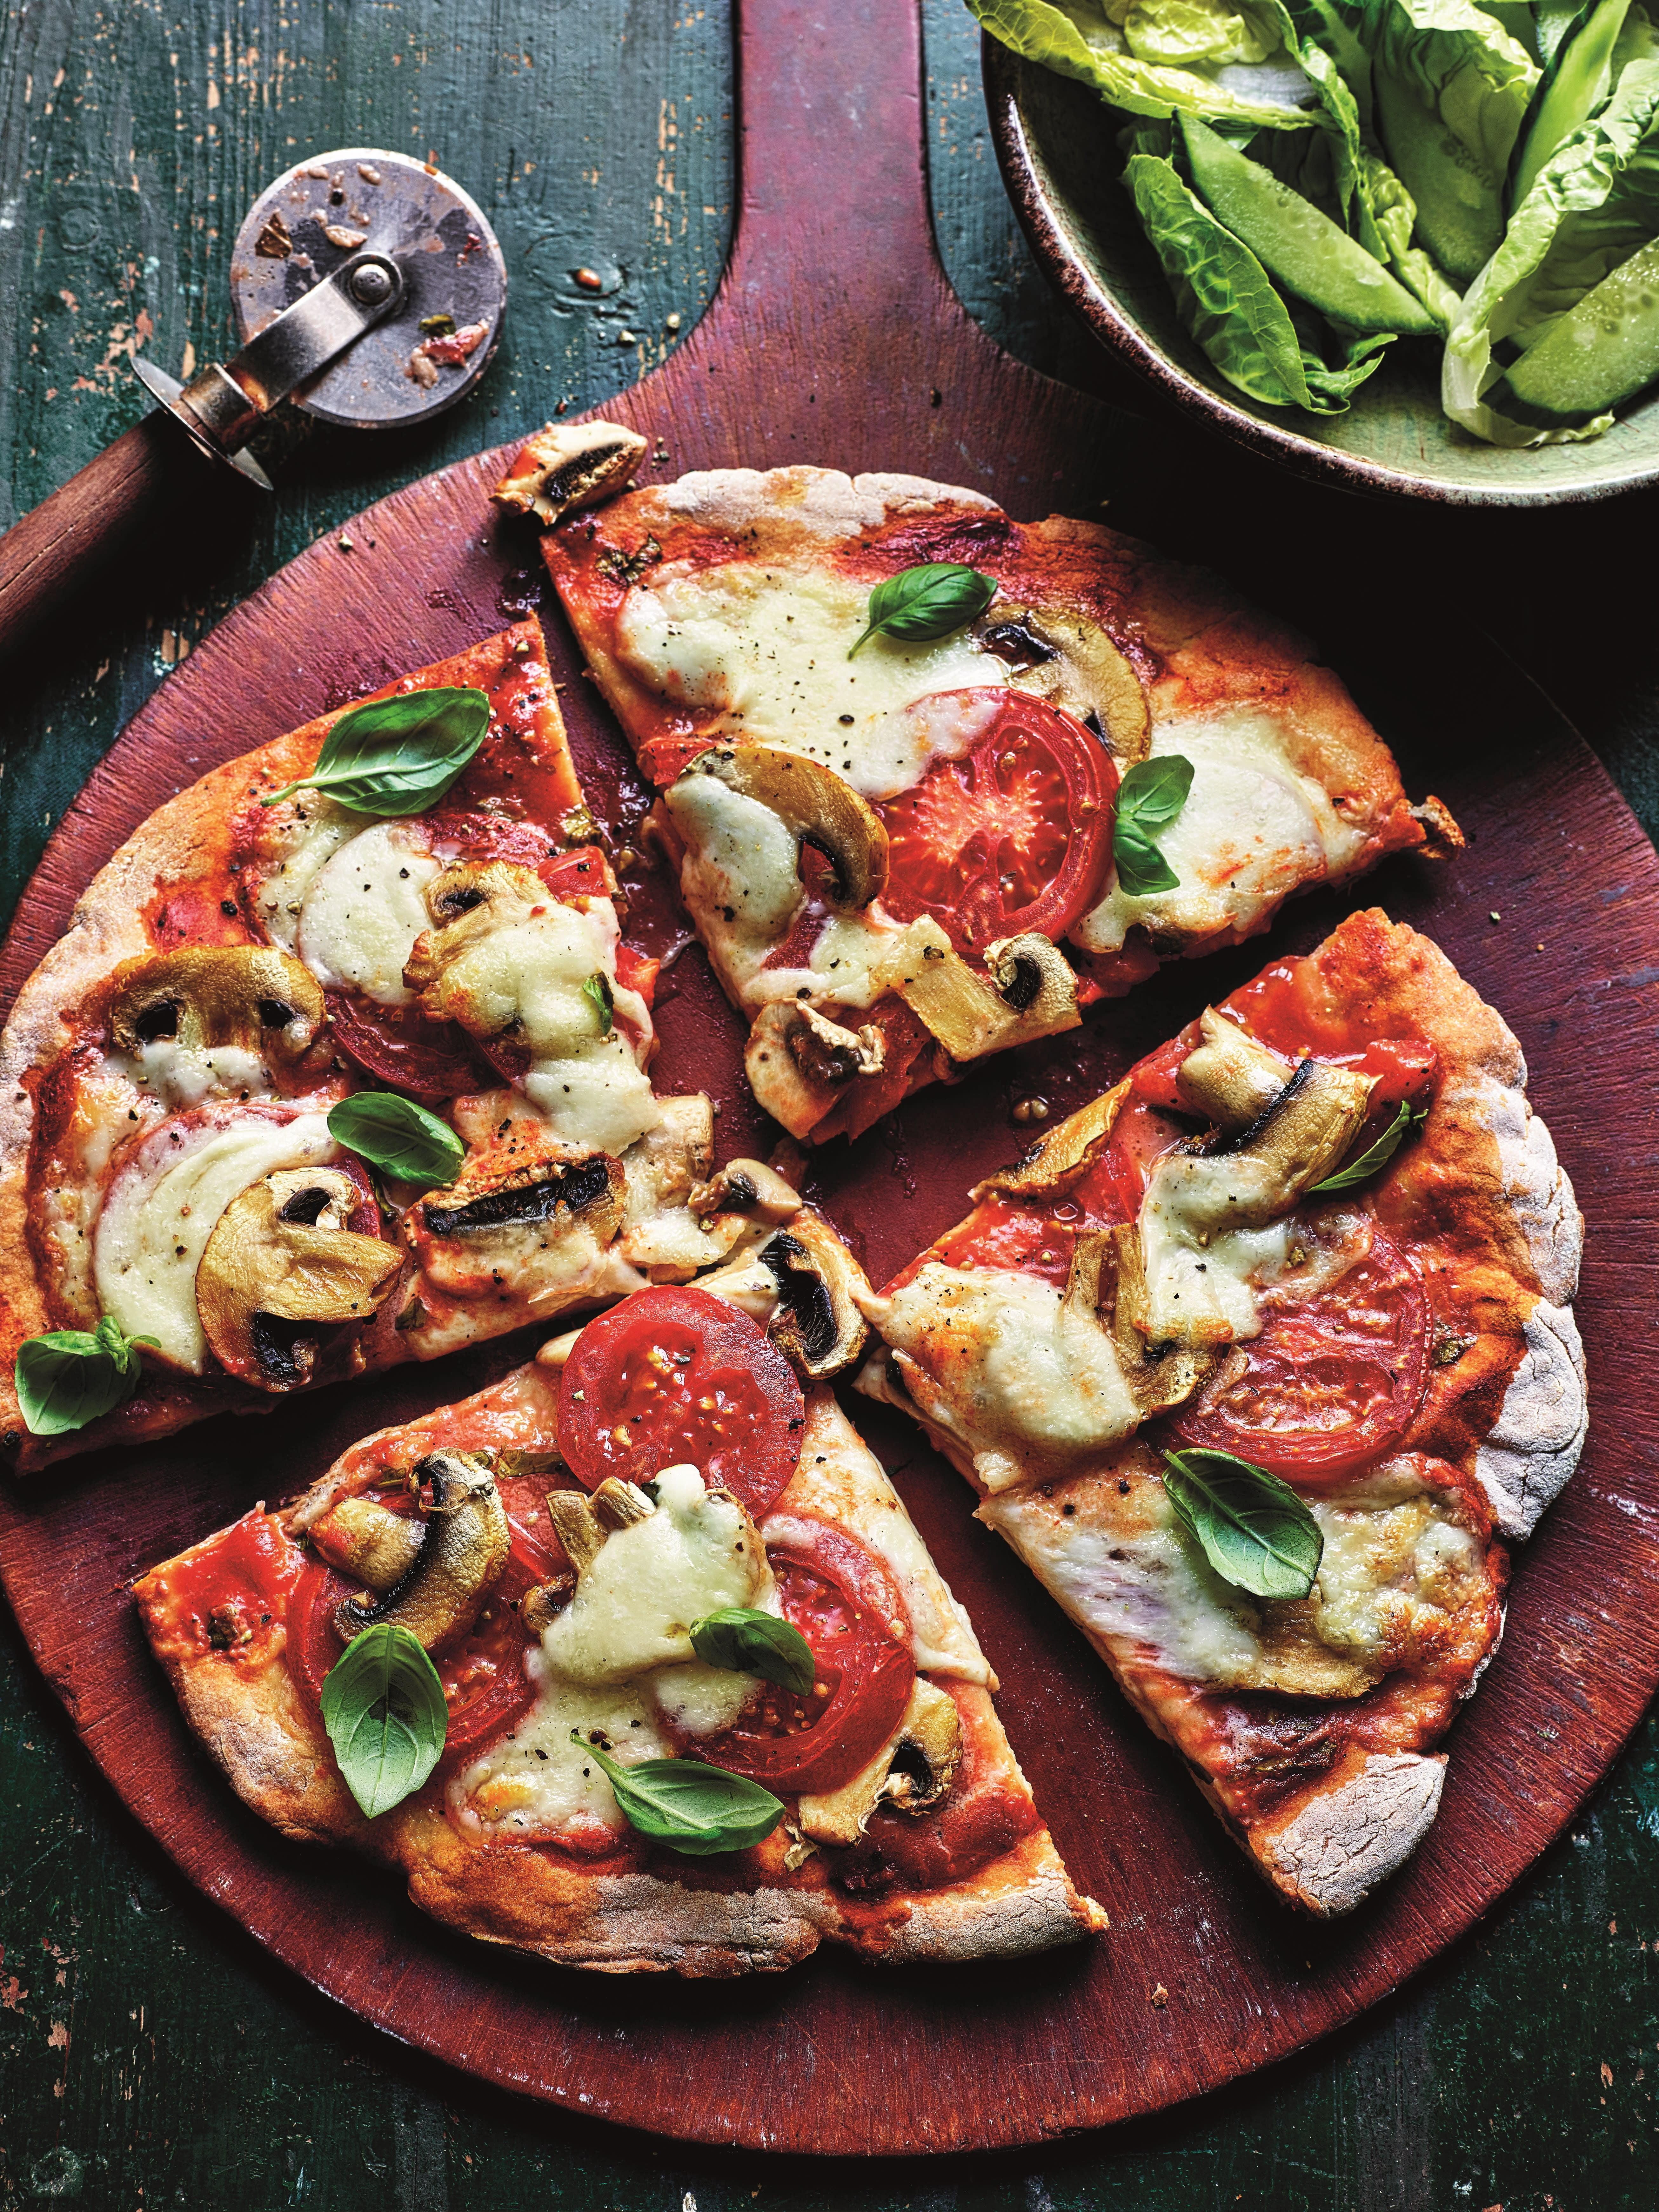 Photo of Tomato & mushroom pizza by WW